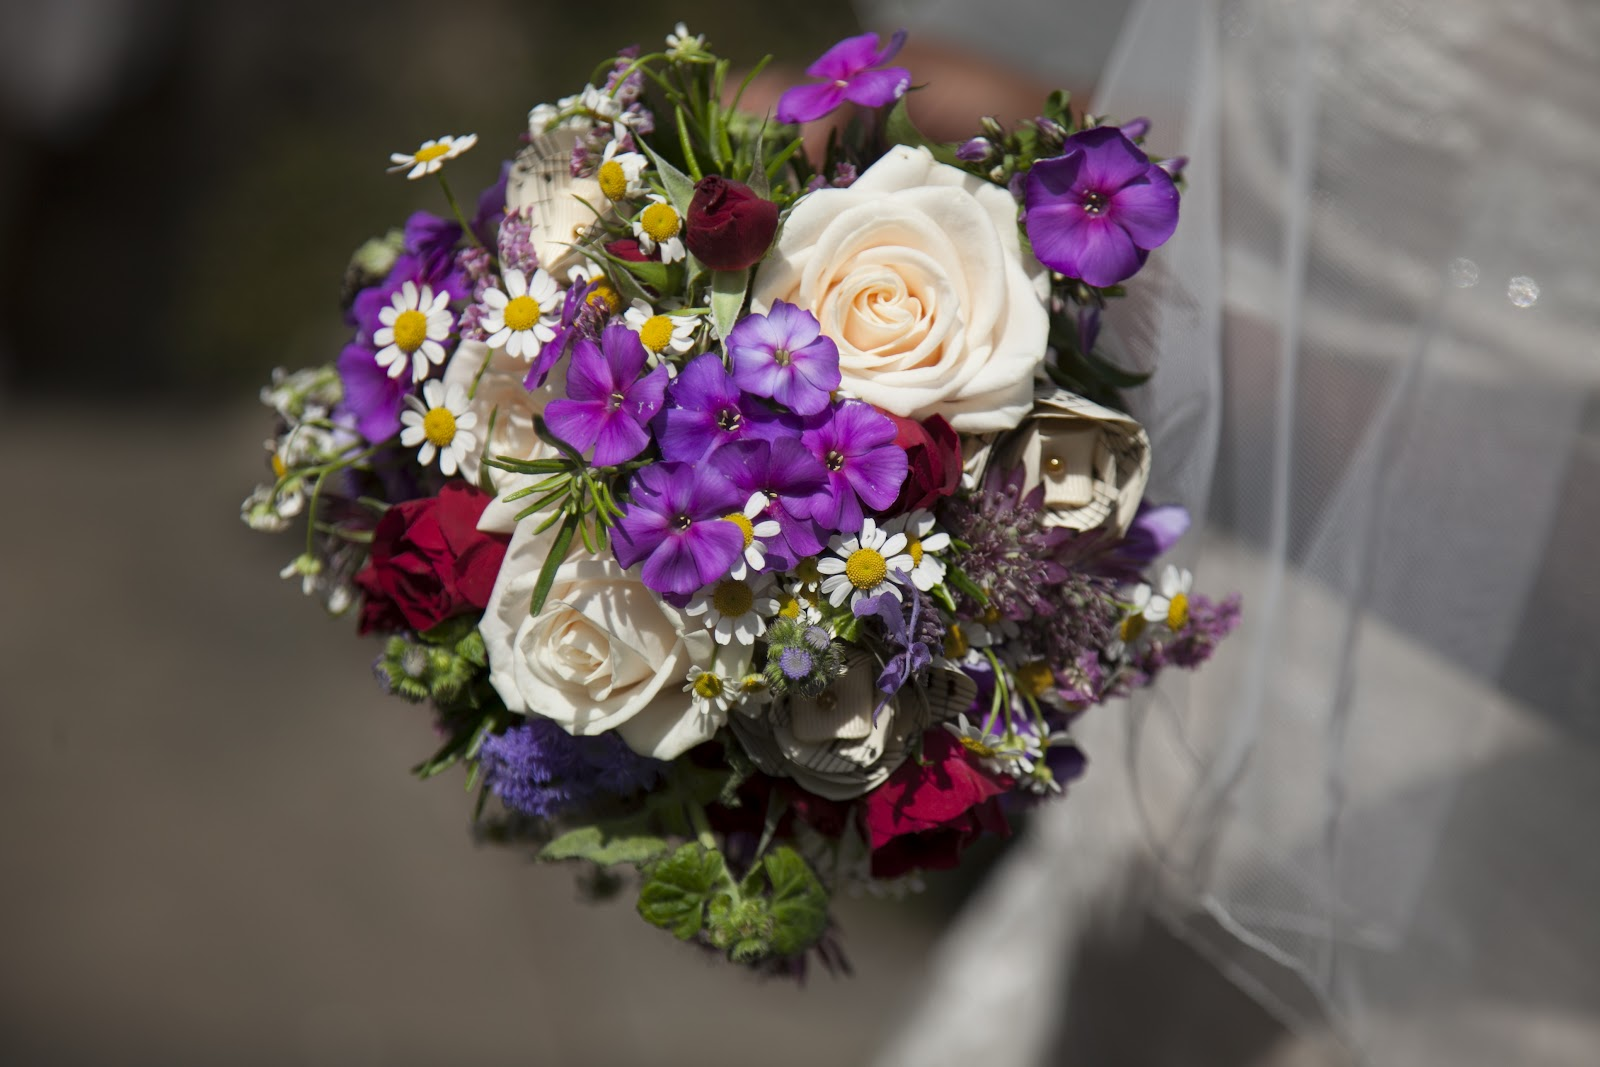 Fabia Turner: Wedding Flowers On The Cheap